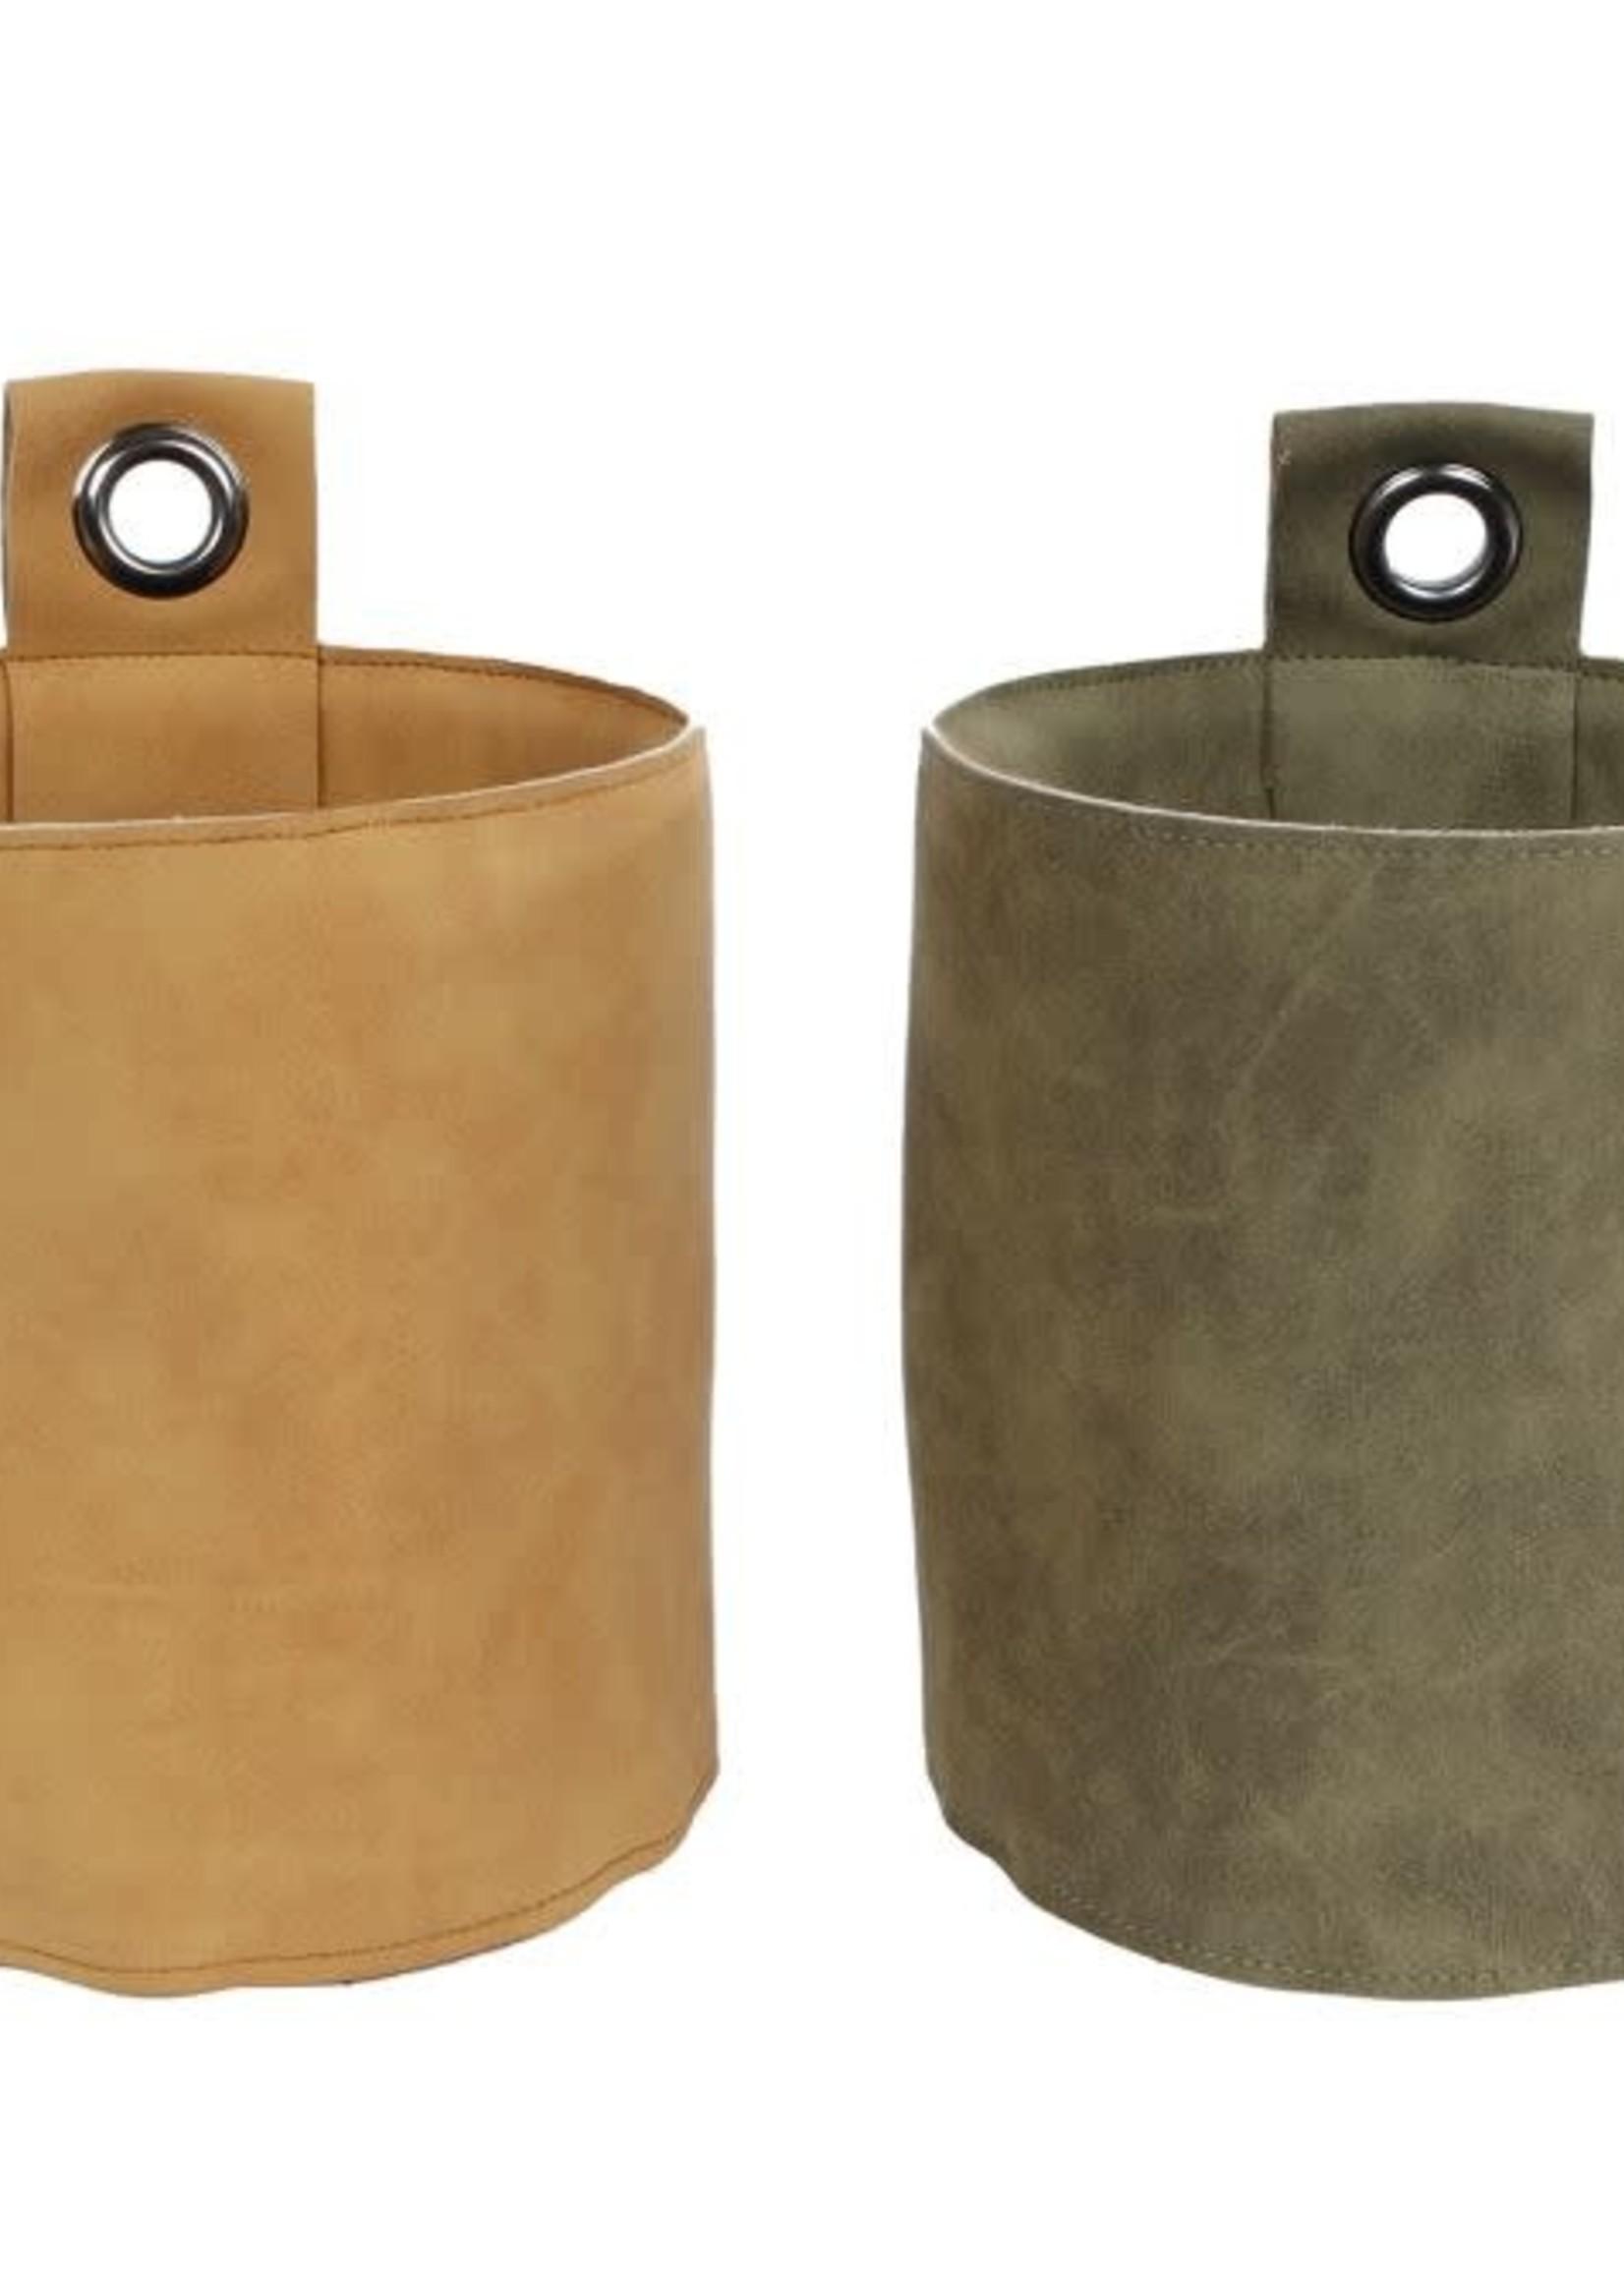 Wandhangpot Koen a2 leatherlook amber/groen 12,5x12,5x14cm